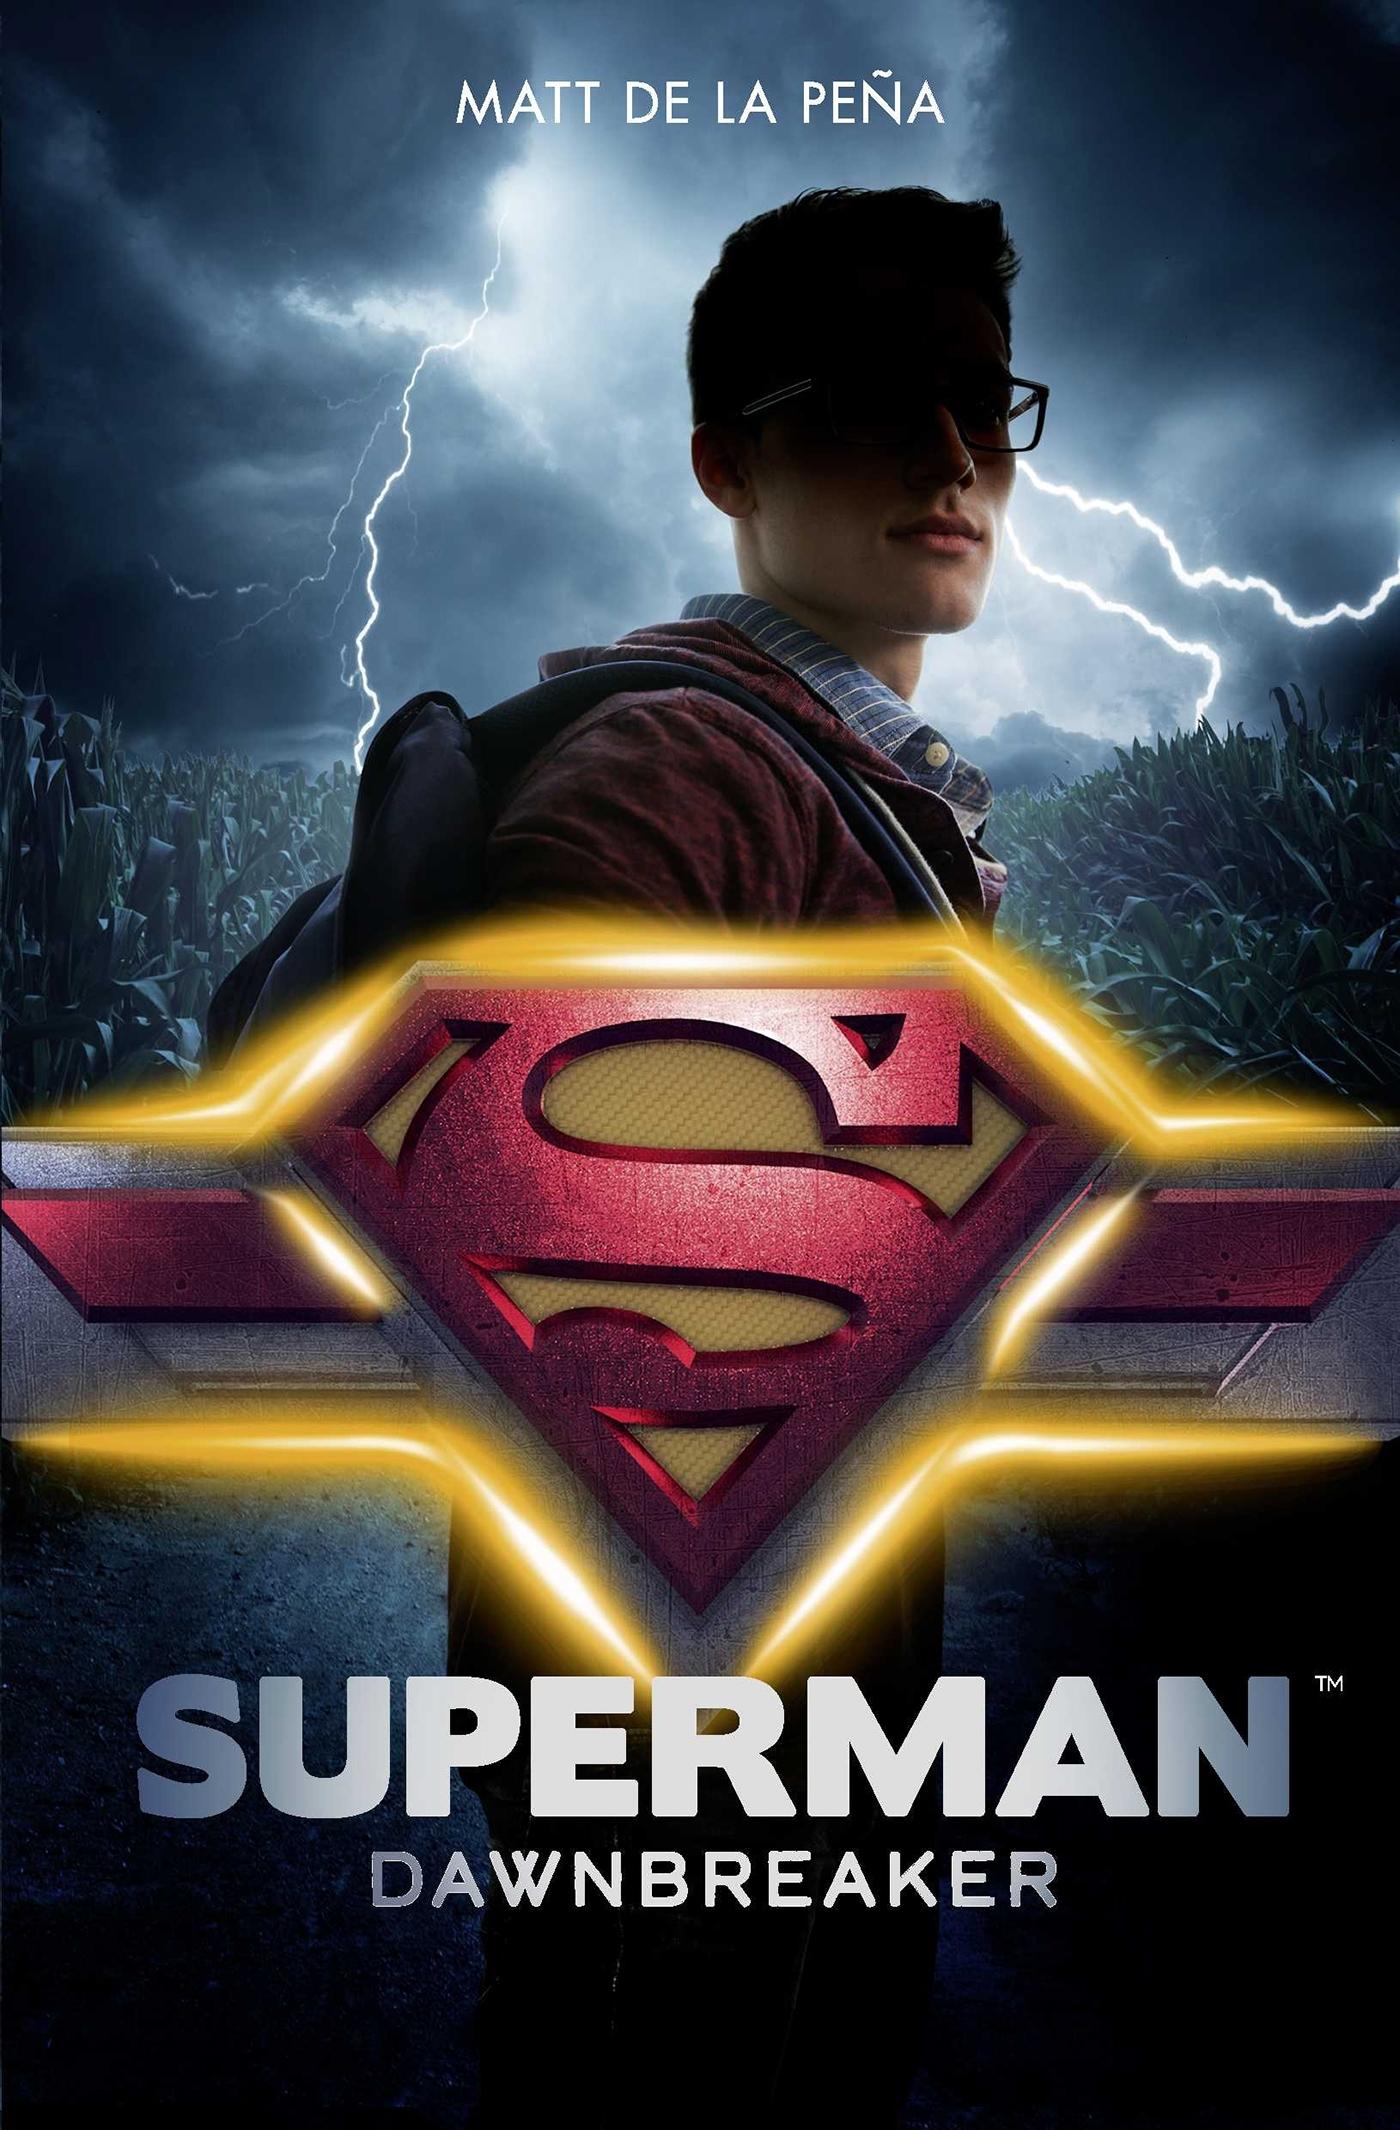 SUPERMAN - DAWNBREAKER